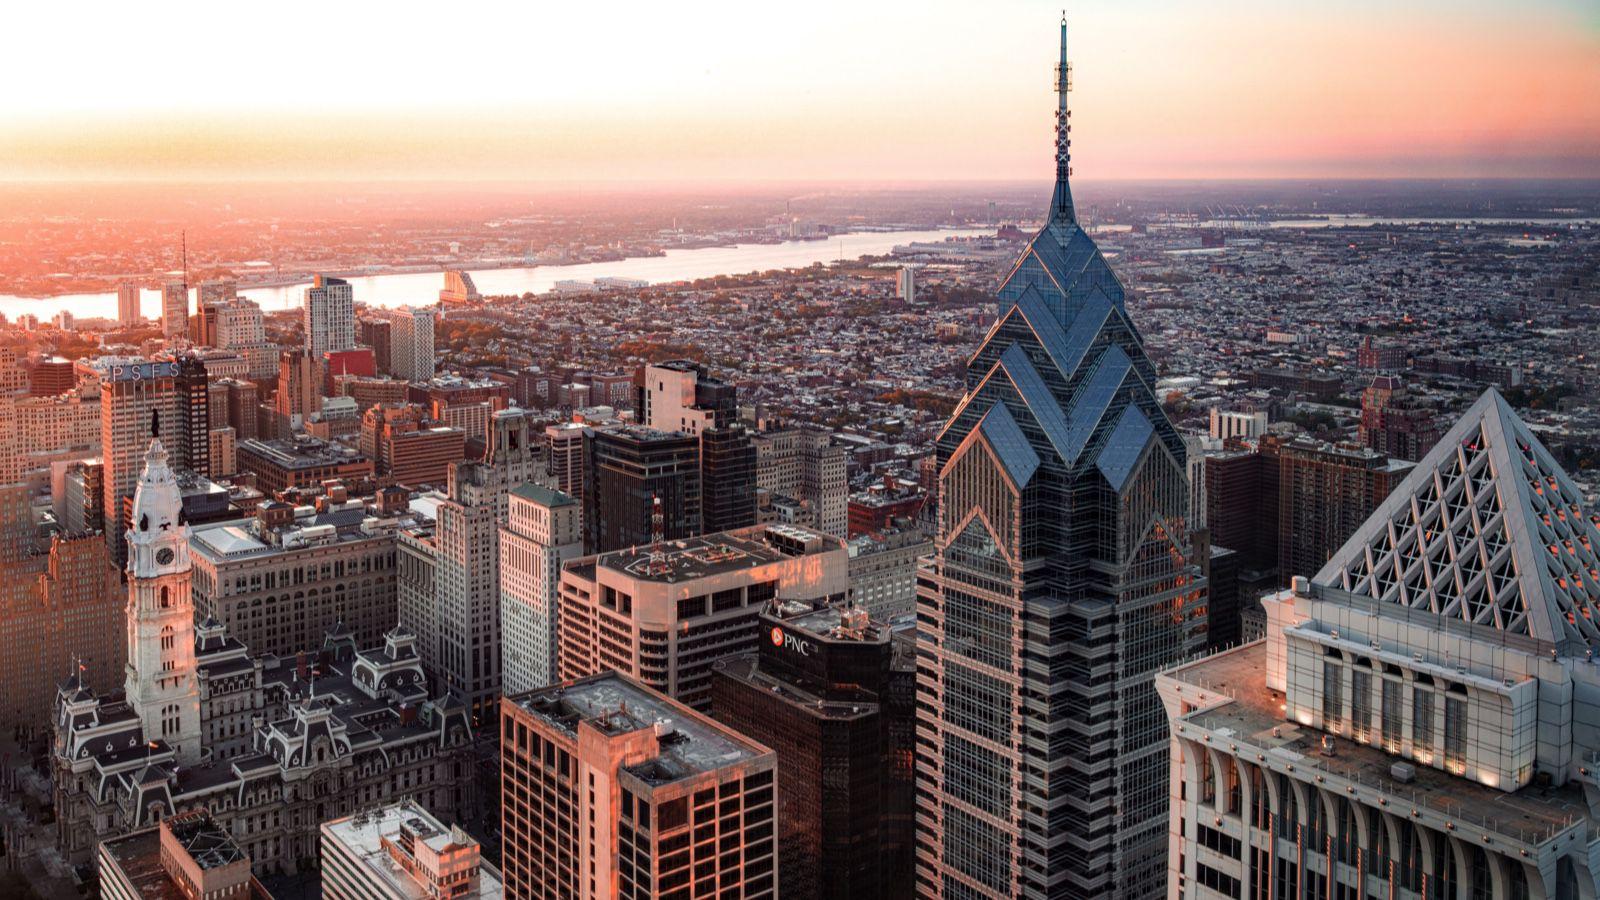 View overlooking Philadelphia cityscape feature 700x375 1.jpg.optimal